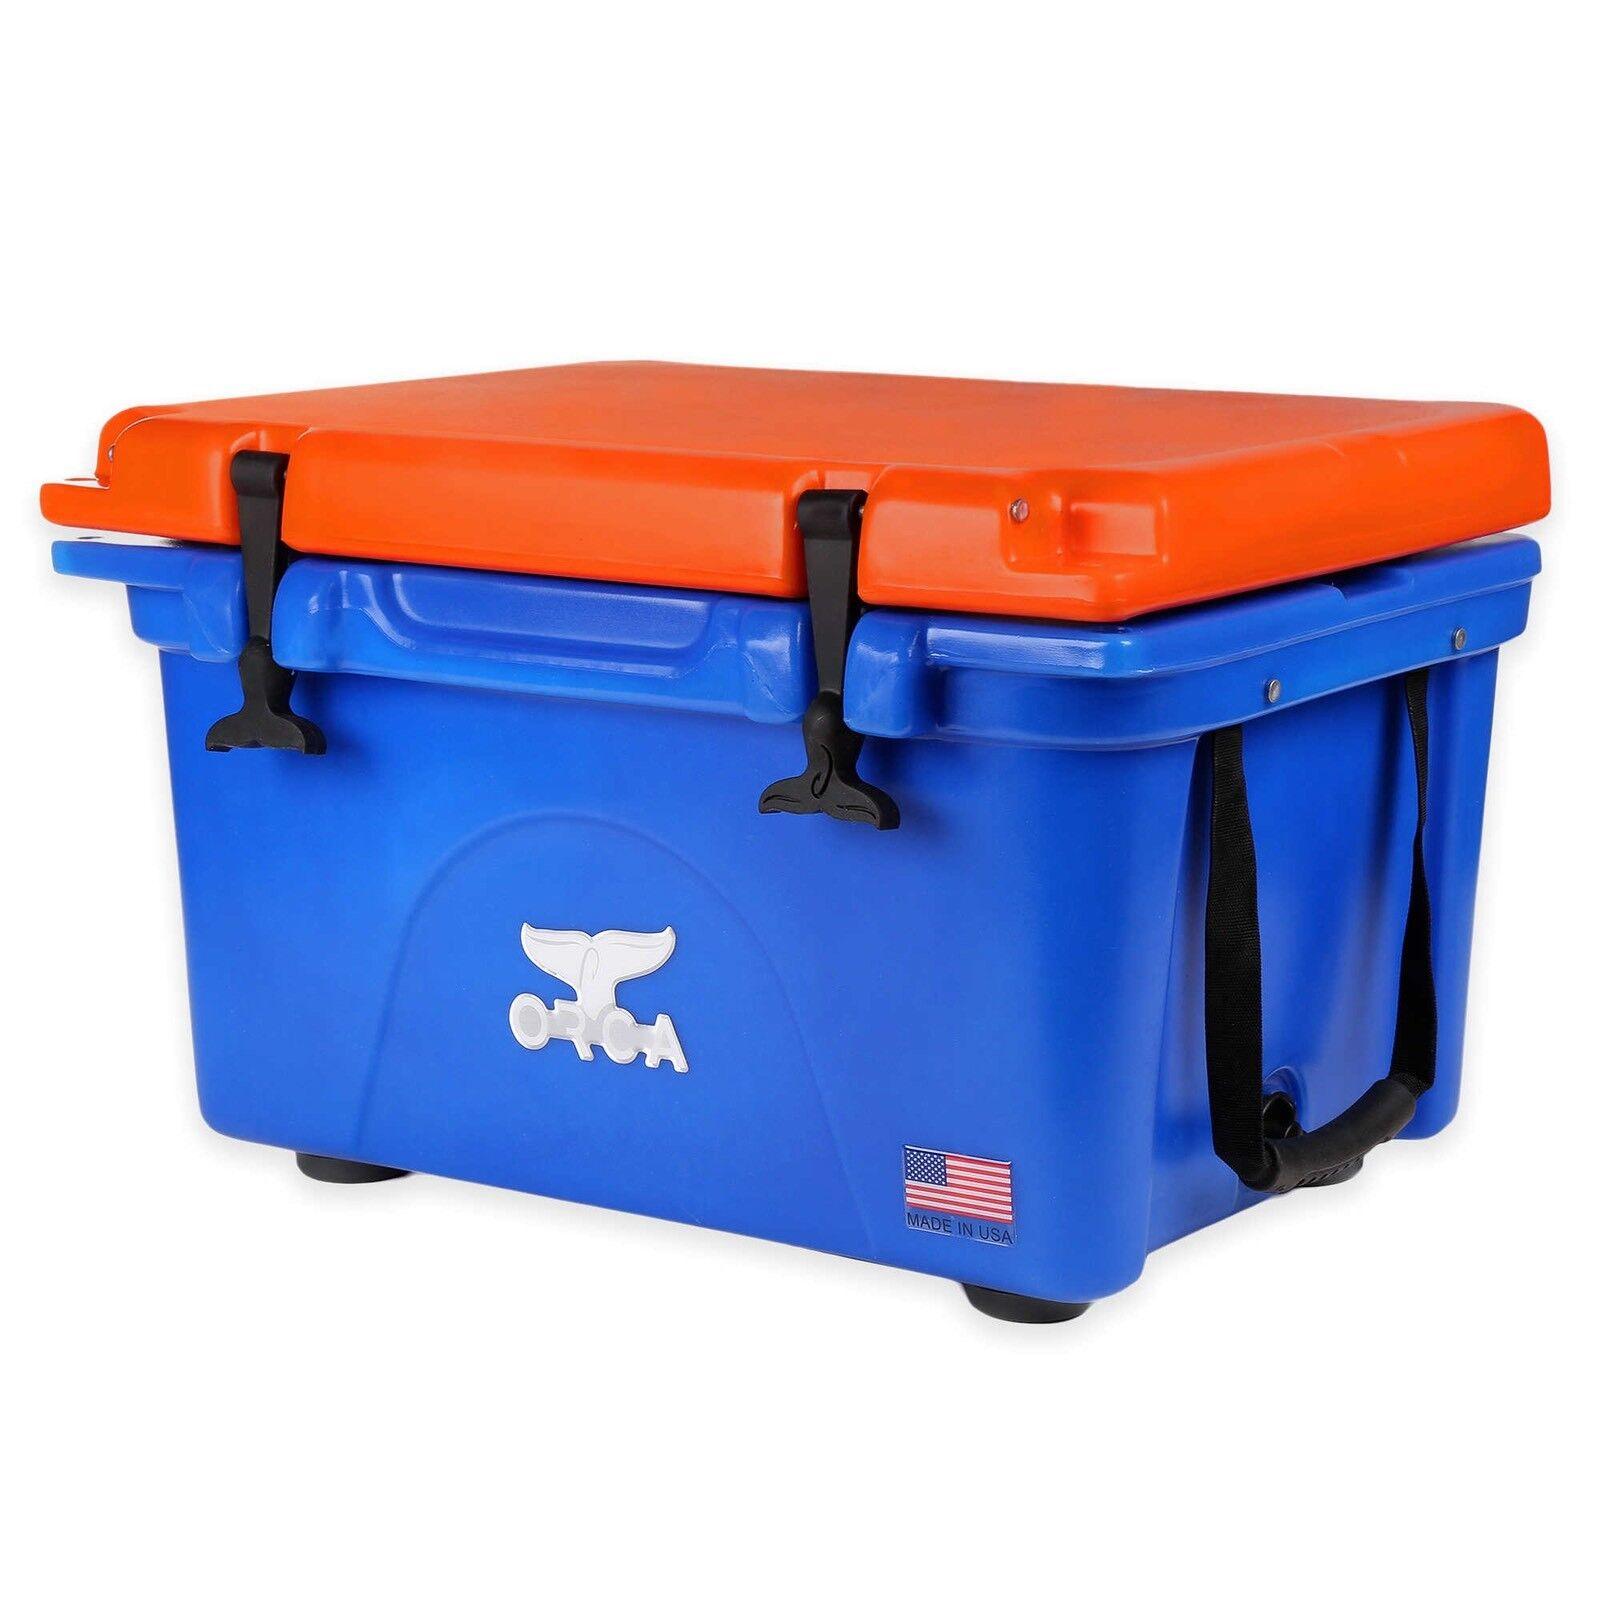 ORCA bluee &  orange 26 qt Cooler   LIFETIME WARRANTY  26 QUART blueE w  orange LID  buy cheap